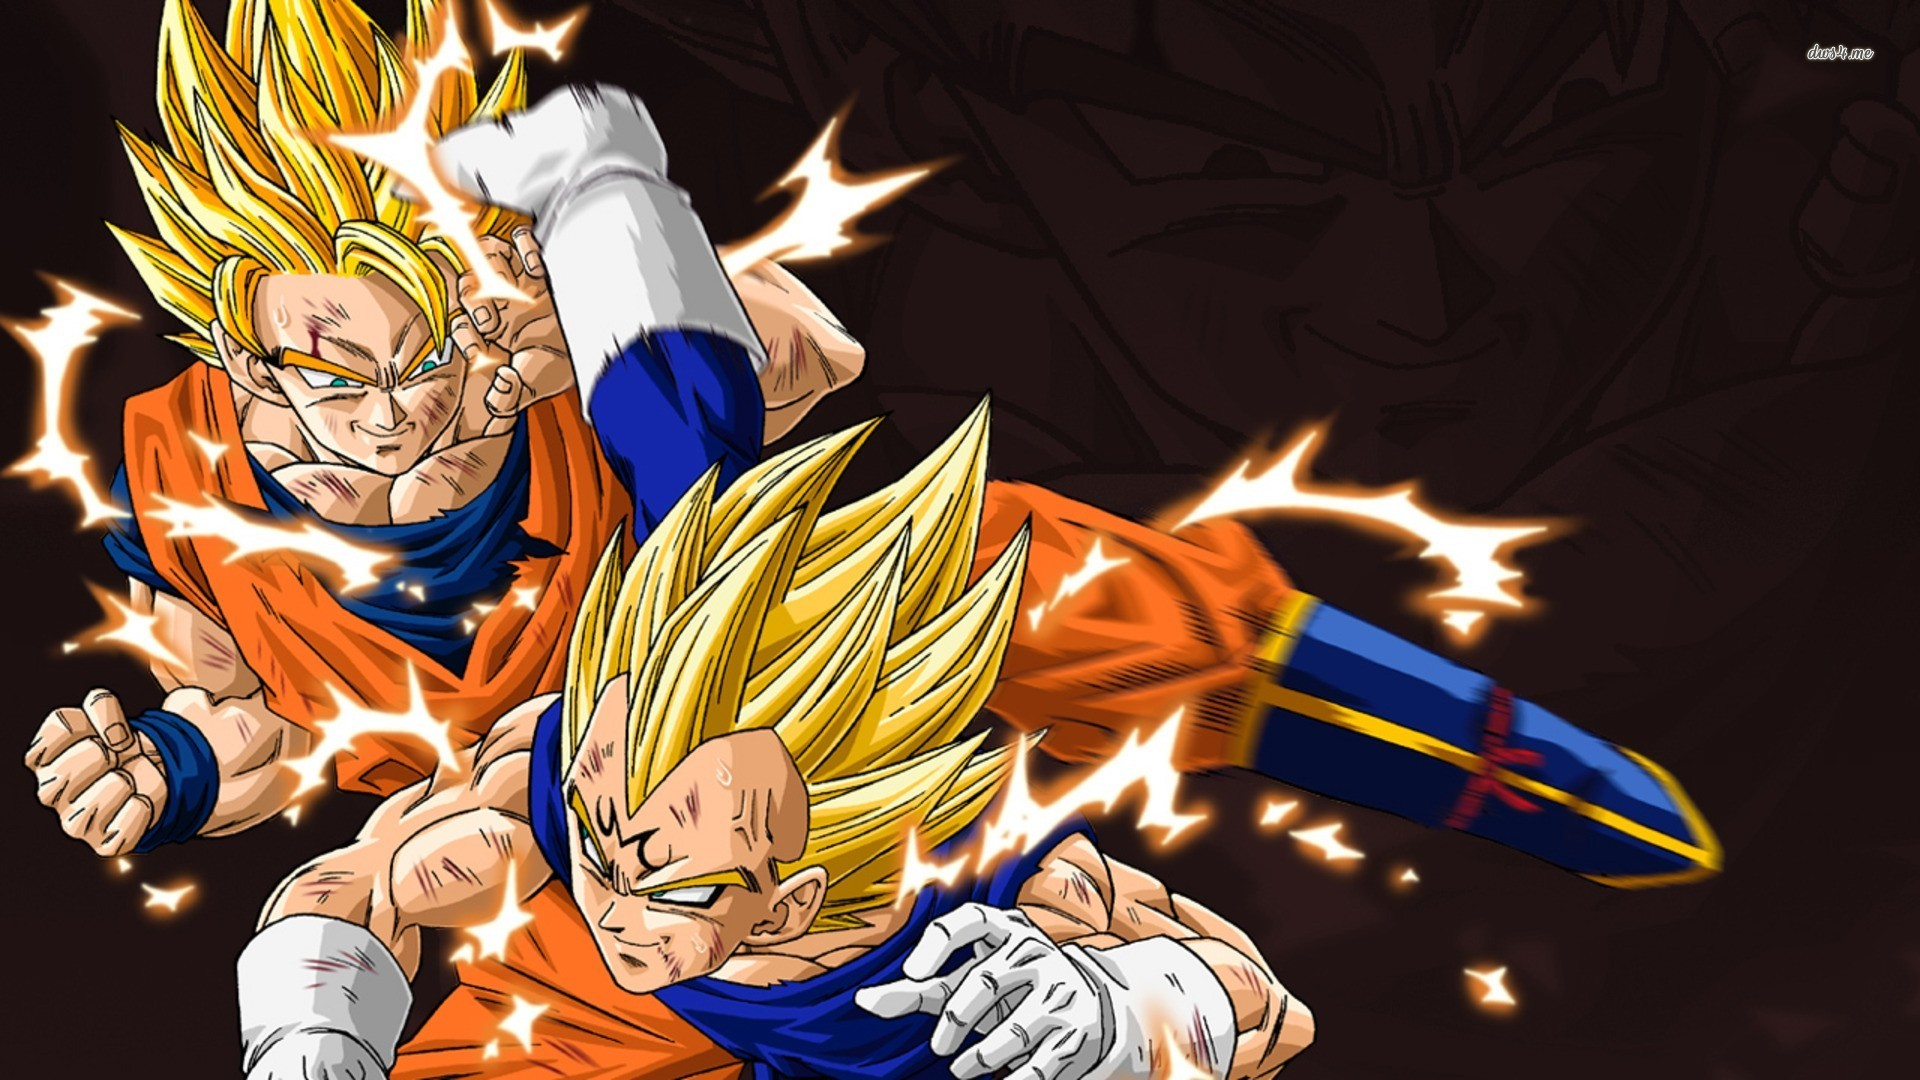 Vegeta and Goku   Dragon Ball Z wallpaper 1920x1080 1920x1080